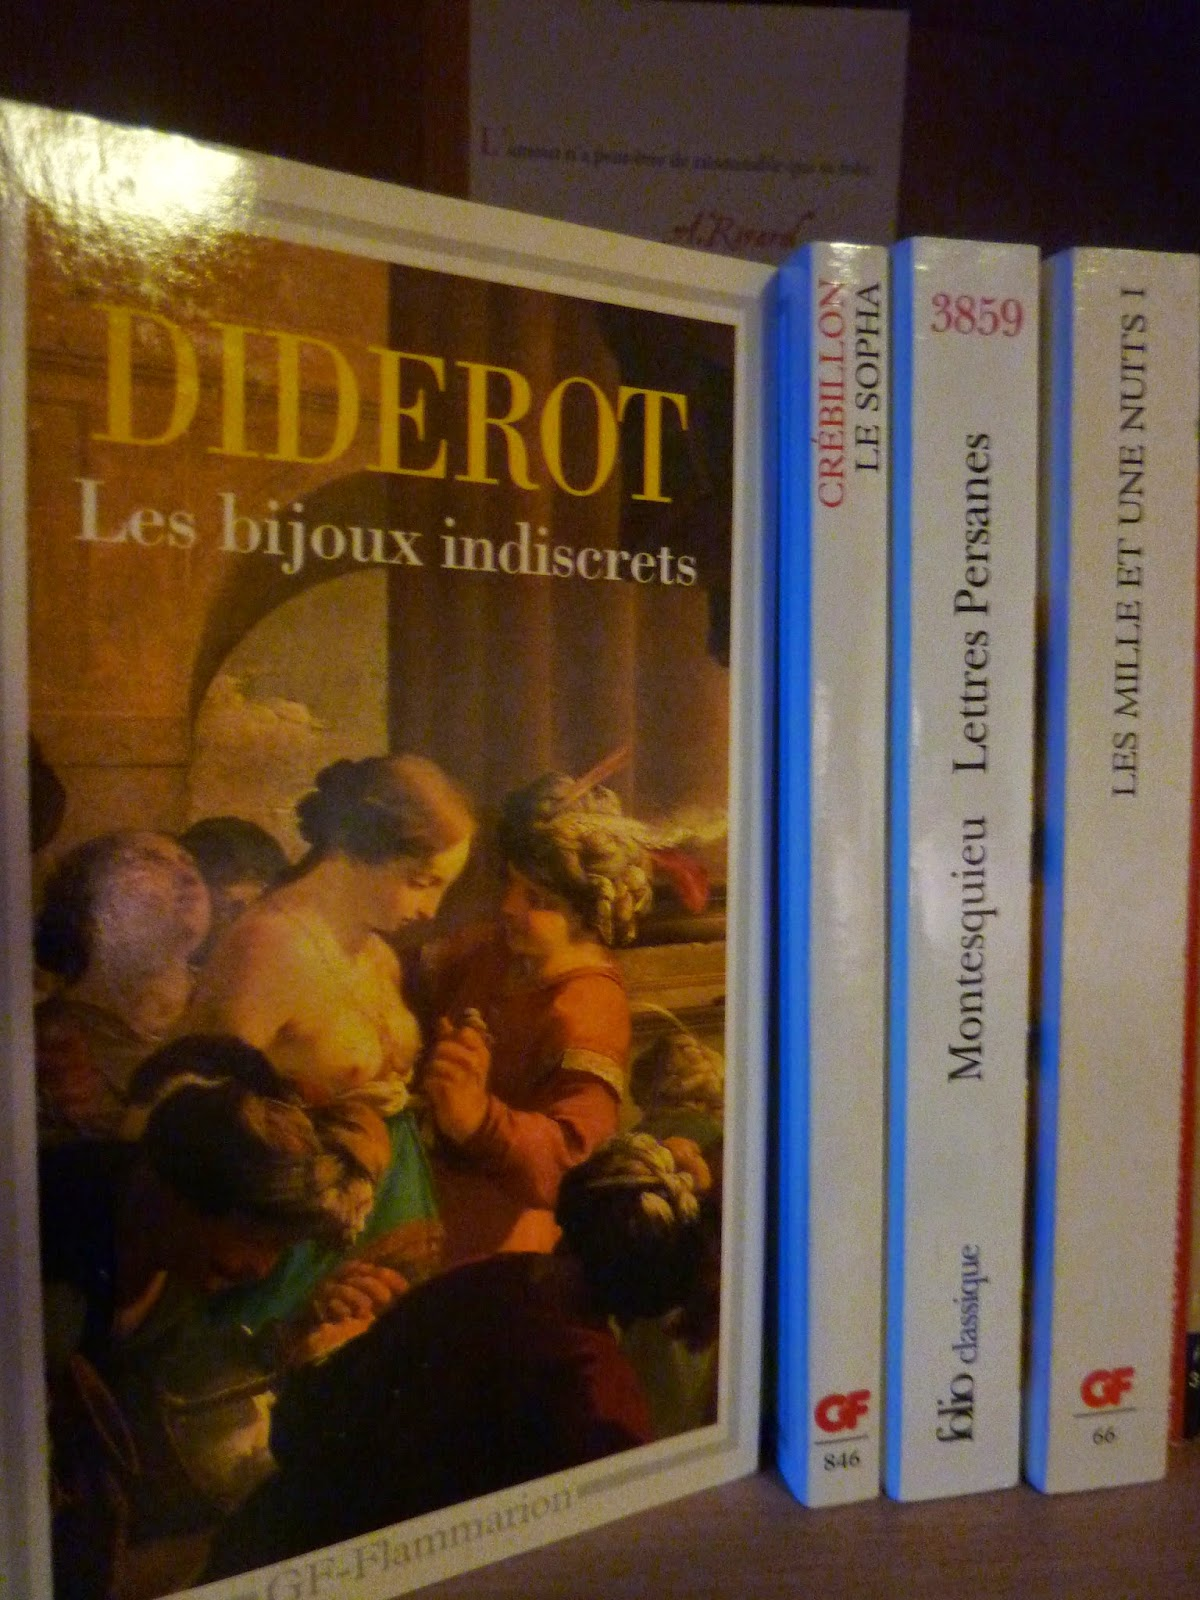 Les bijoux indiscrets - Denis Diderot